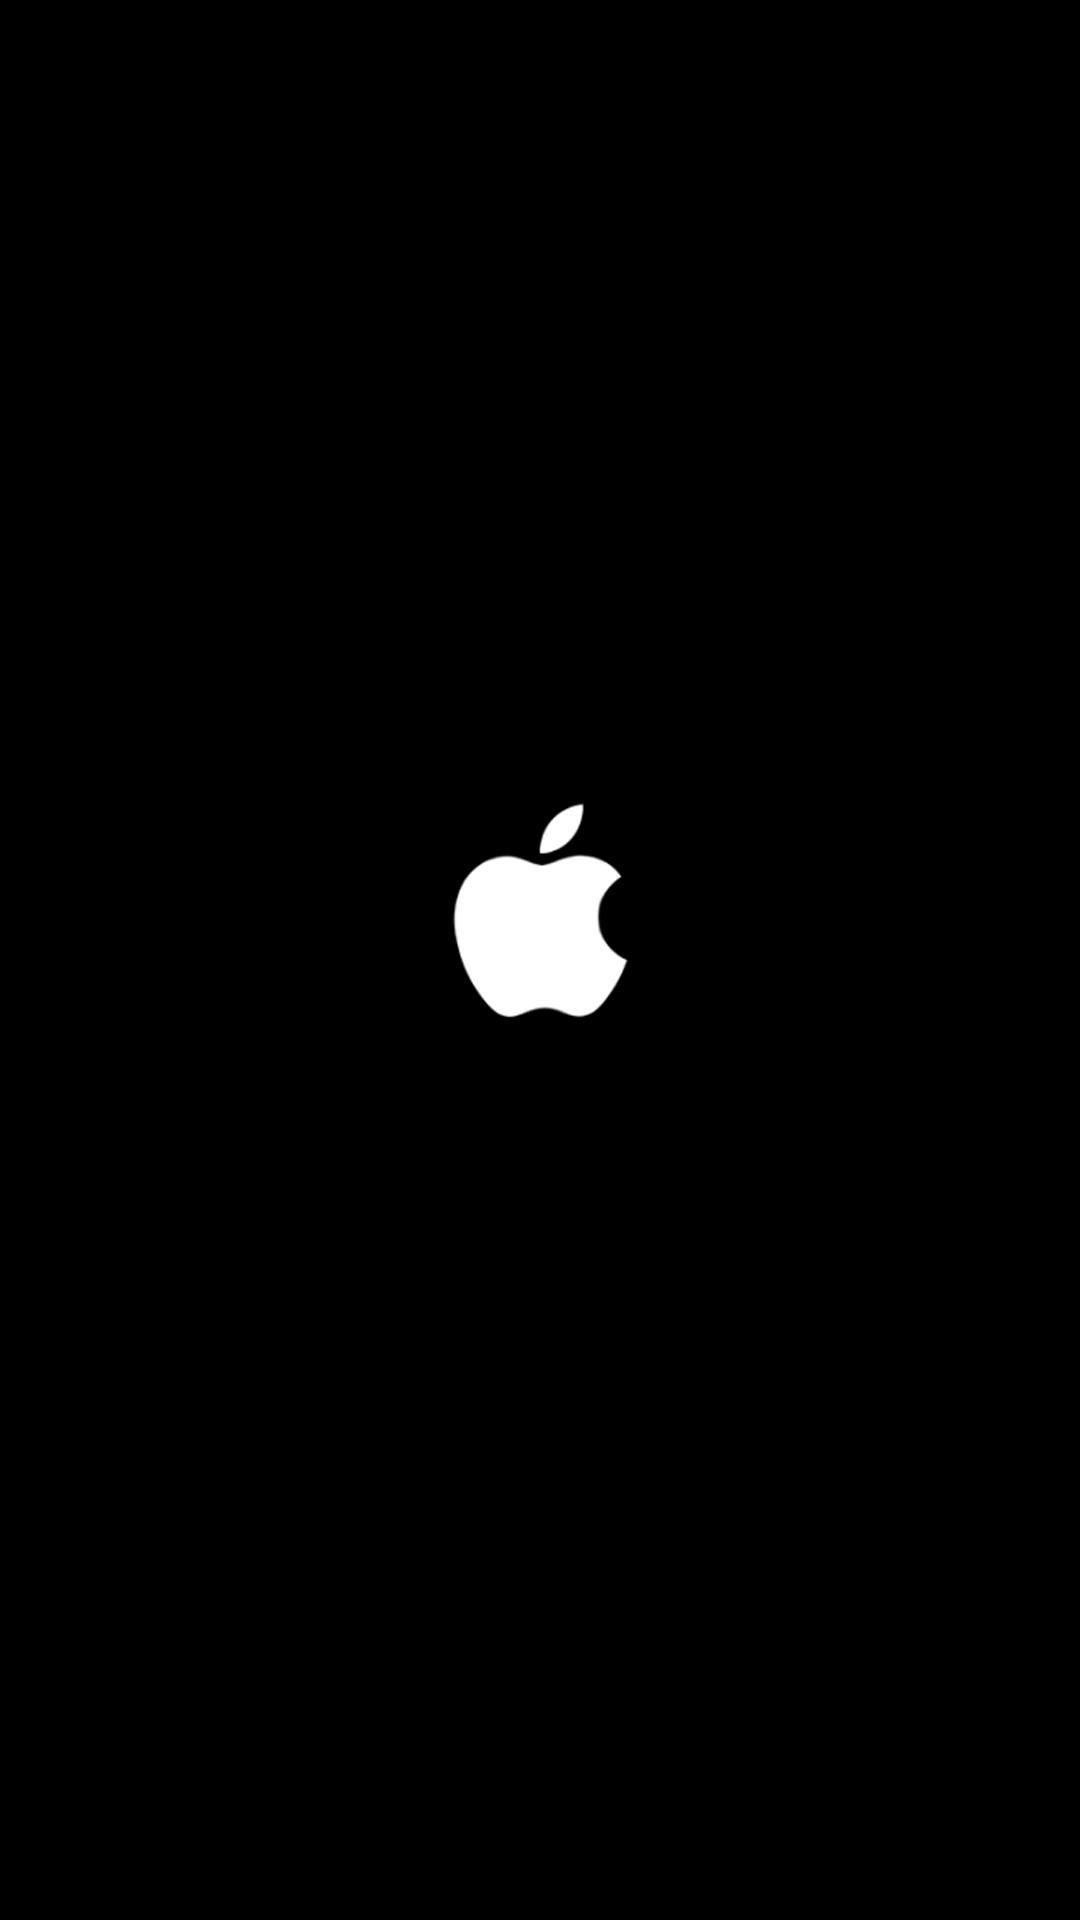 Iphone 7 Wallpaper 4k Black